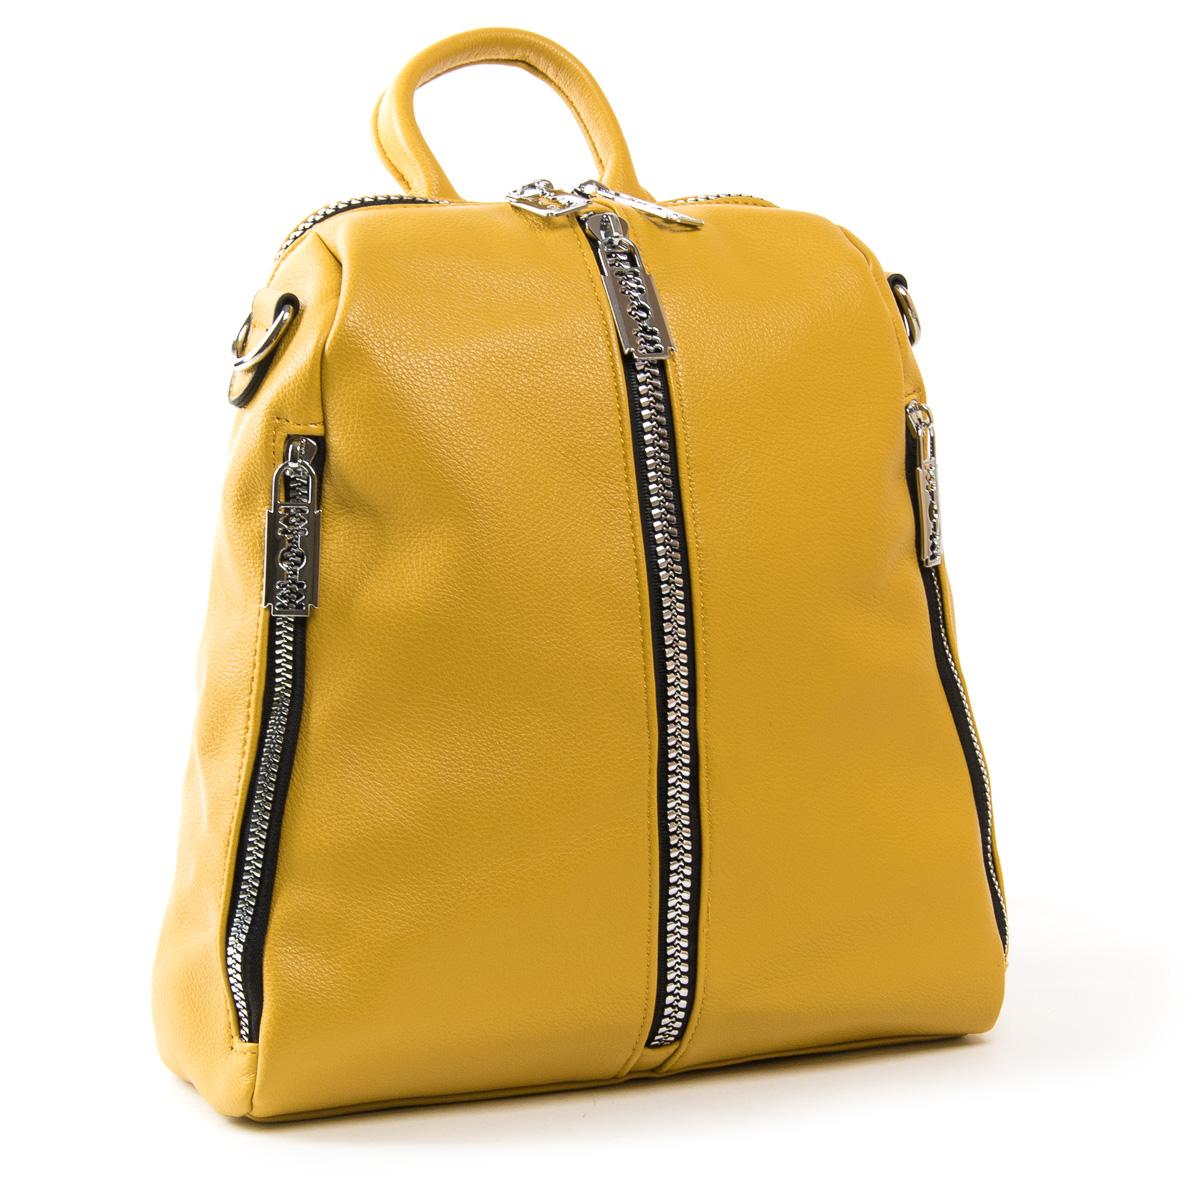 Сумка Женская Рюкзак иск-кожа FASHION 01-02 6487 yellow